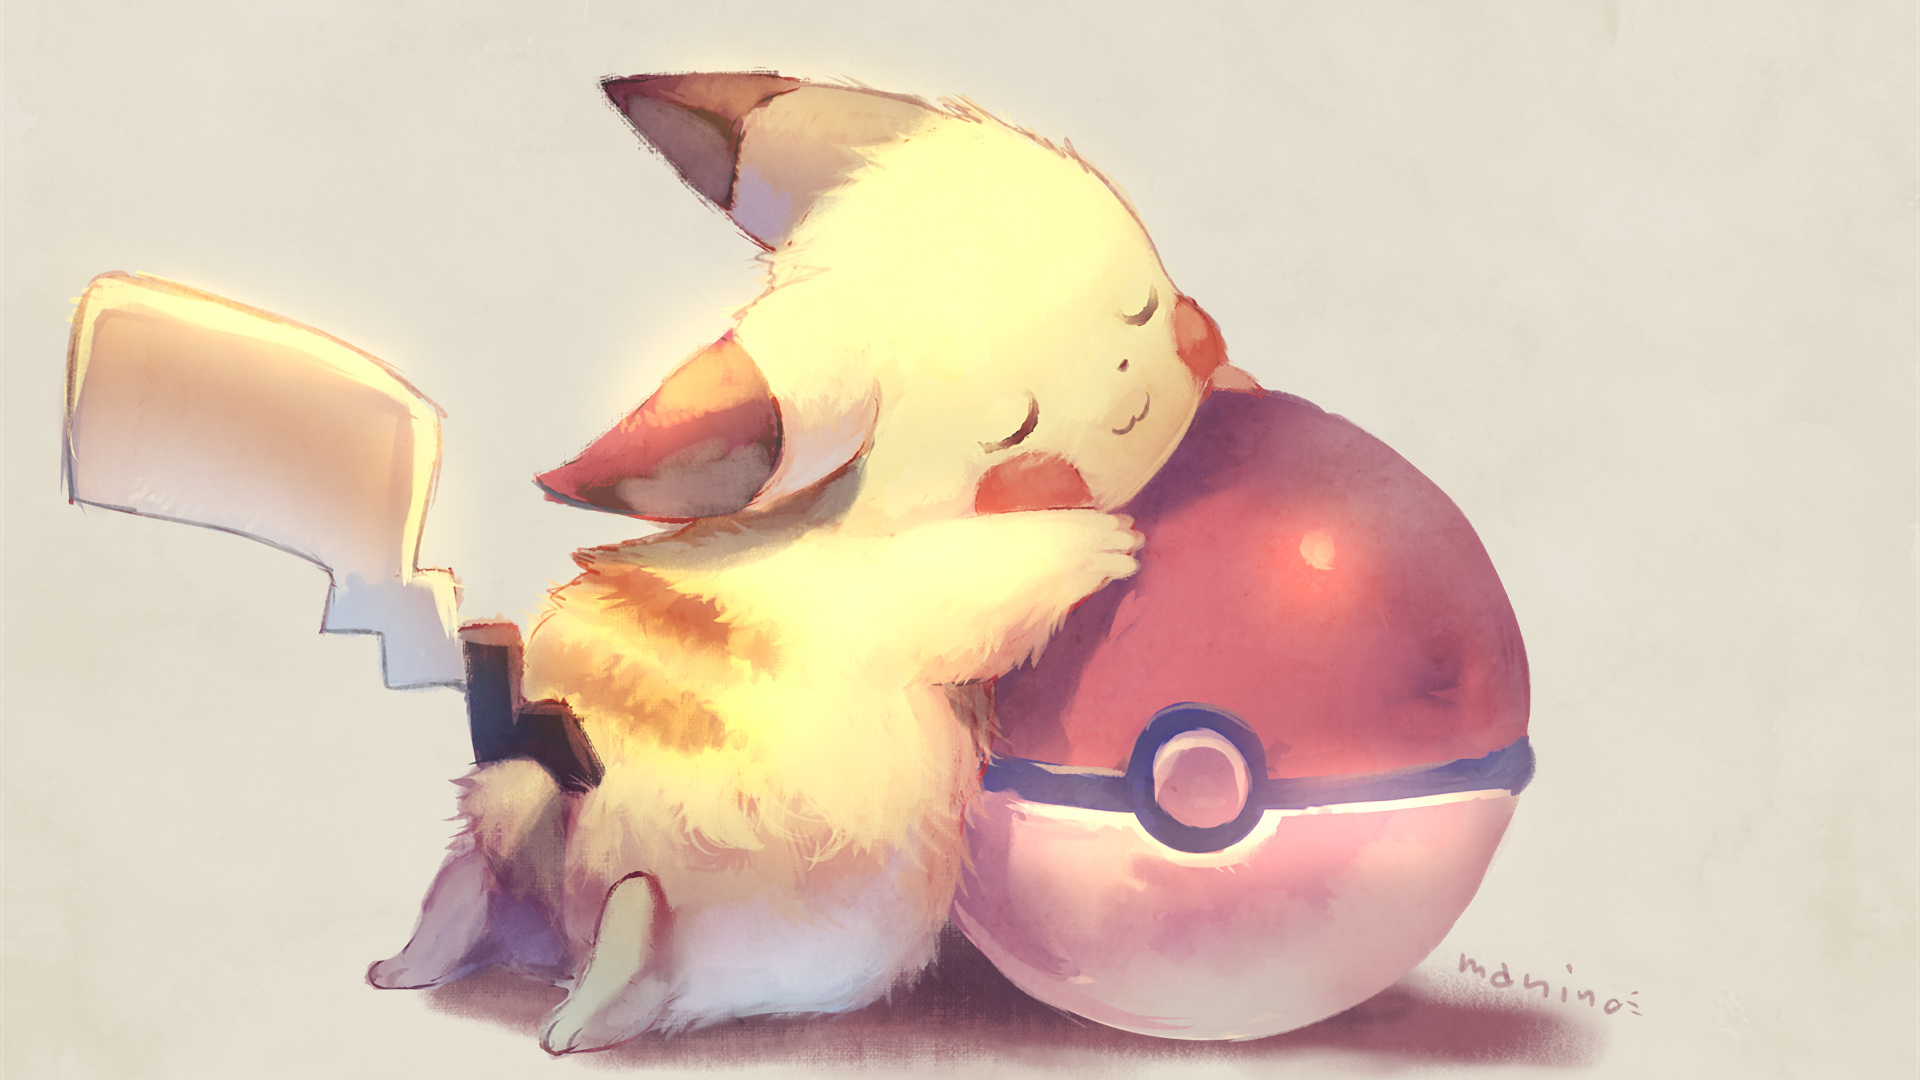 1920x1080 Pokemon Cute Artwork Laptop Full HD 1080P HD 4k Wallpapers, Images, Backgrounds ...